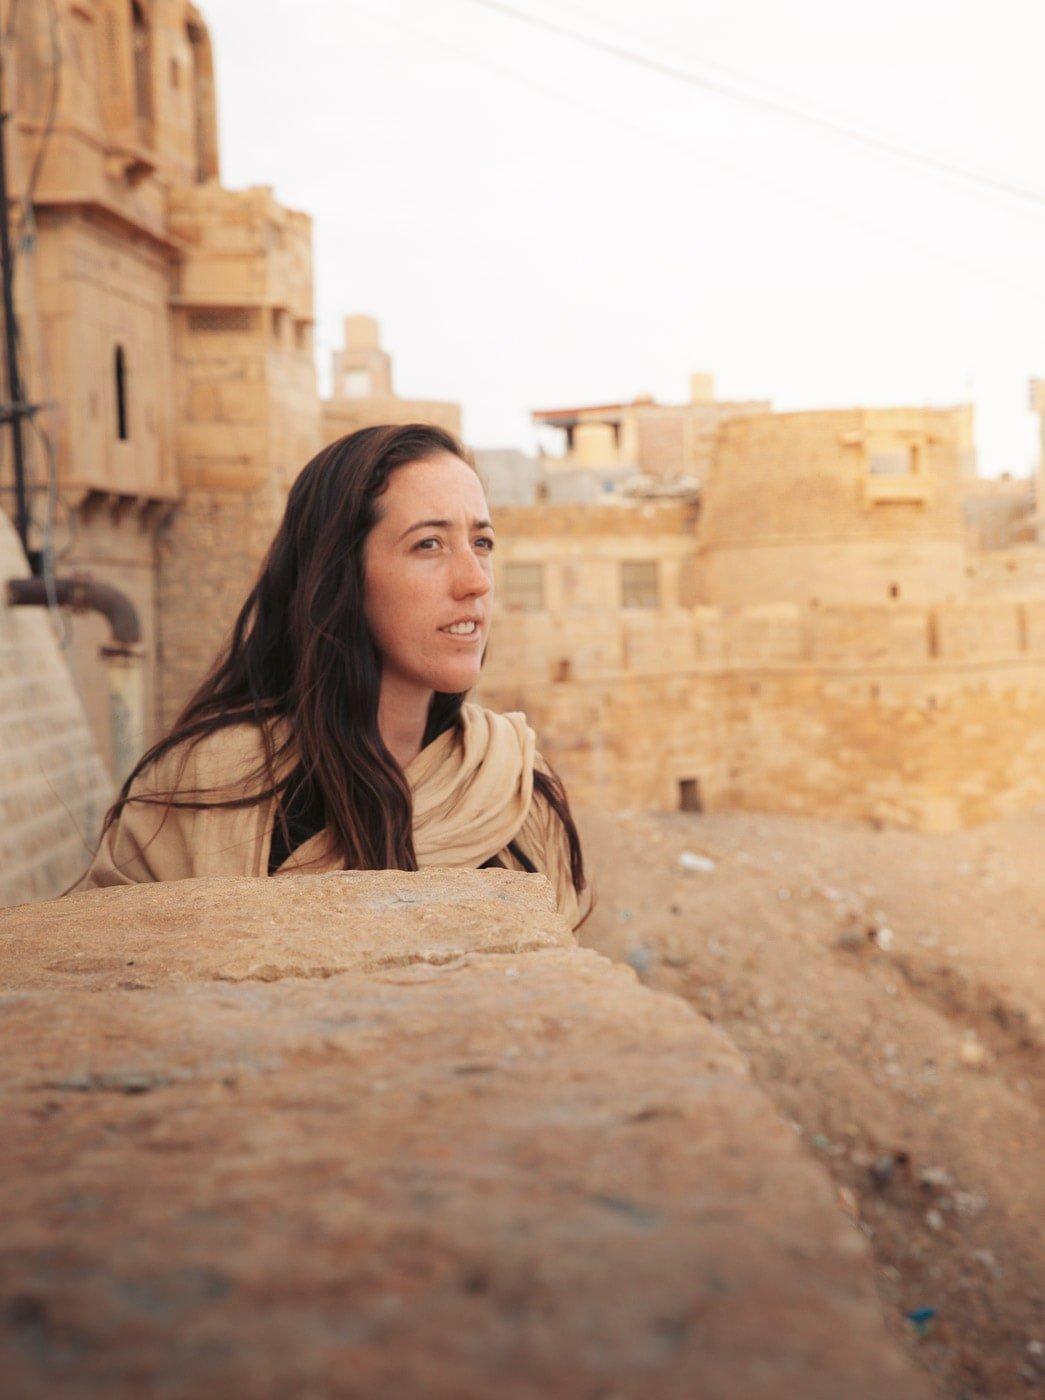 HAYLEA BROWN EXPLORING THE JAISALMER FORT IN RAJASTHAN